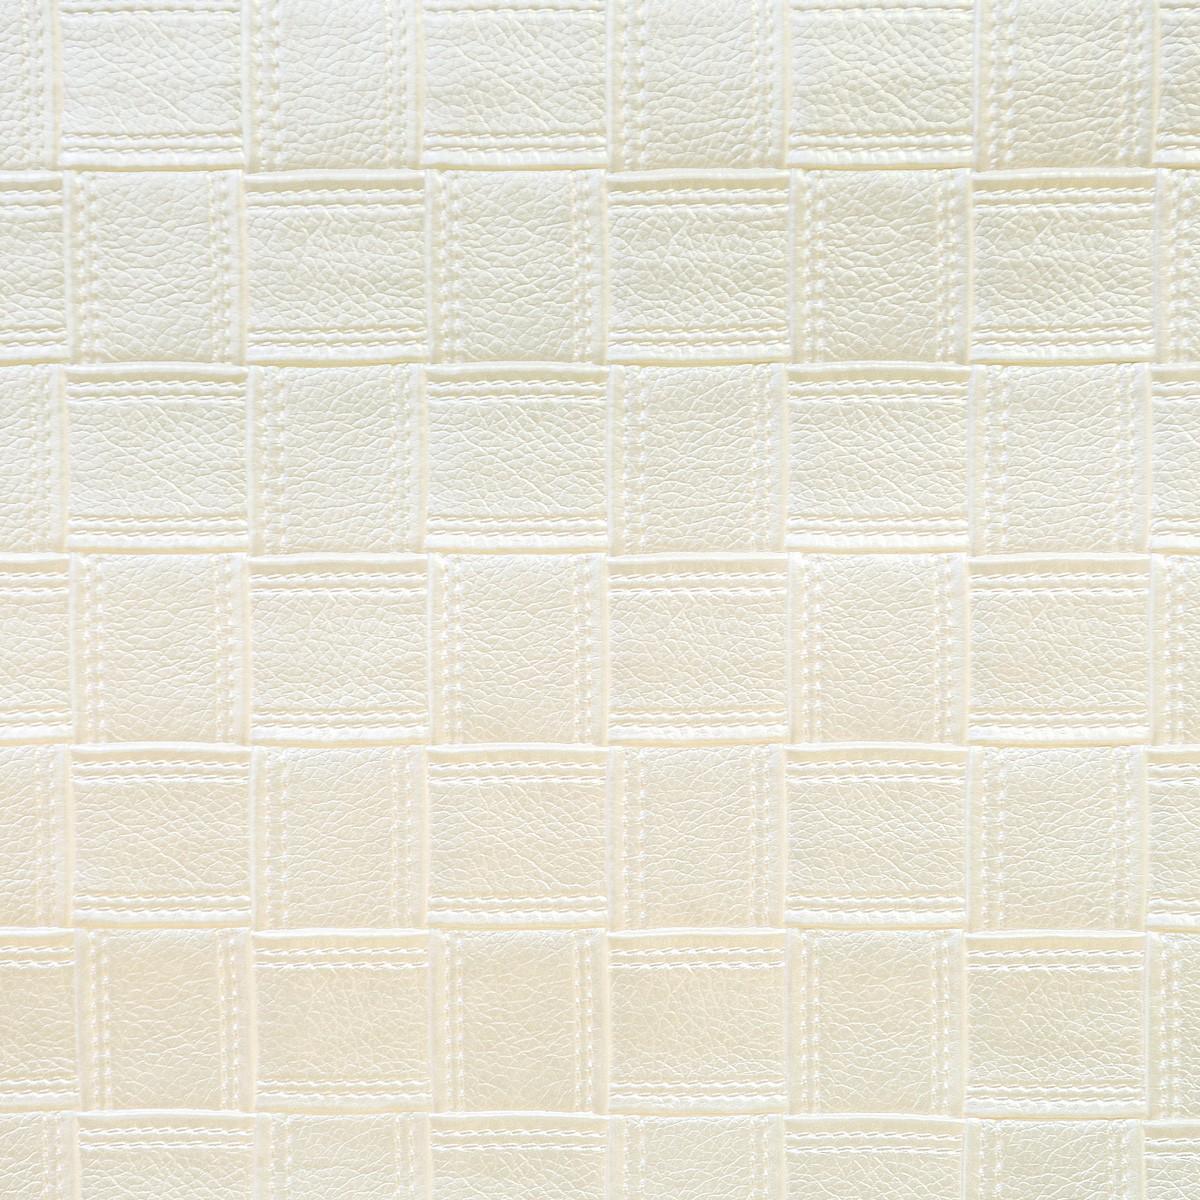 100 nappe simili cuir tissu simili cuir cailles platine mondial tissu - Tissu simili cuir blanc ...